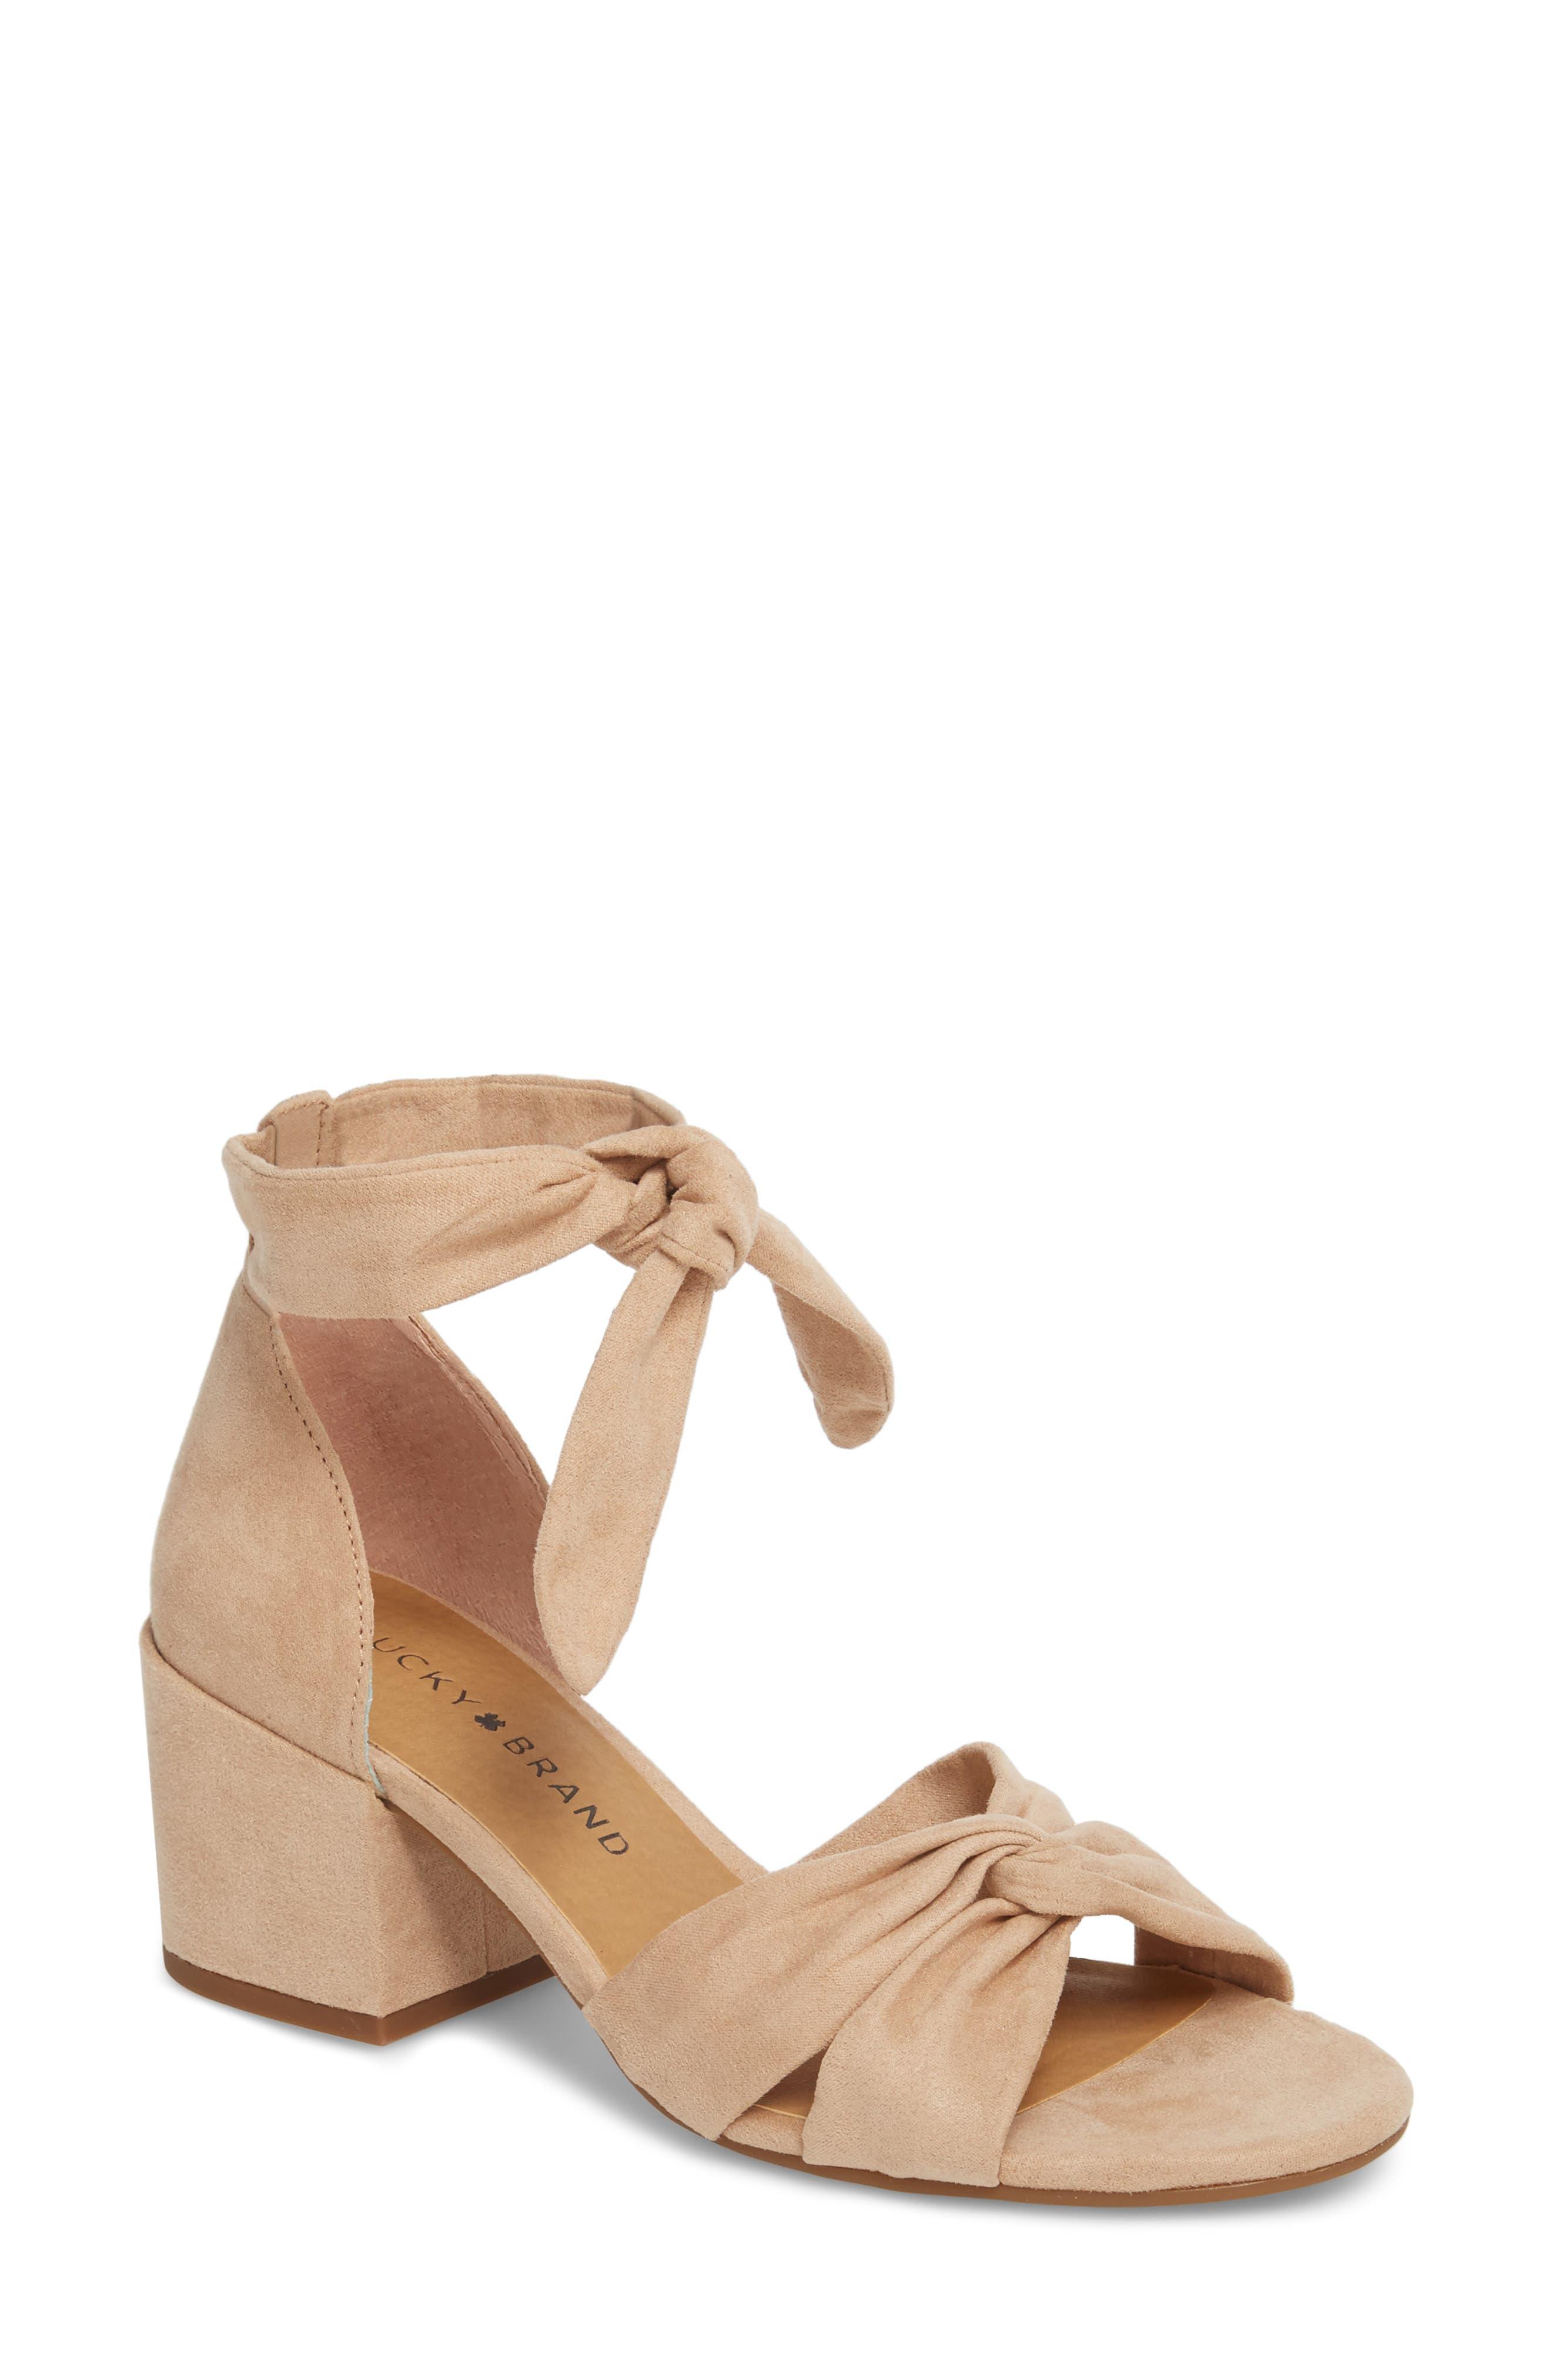 Xaylah Ankle Strap Sandal,                             Main thumbnail 5, color,